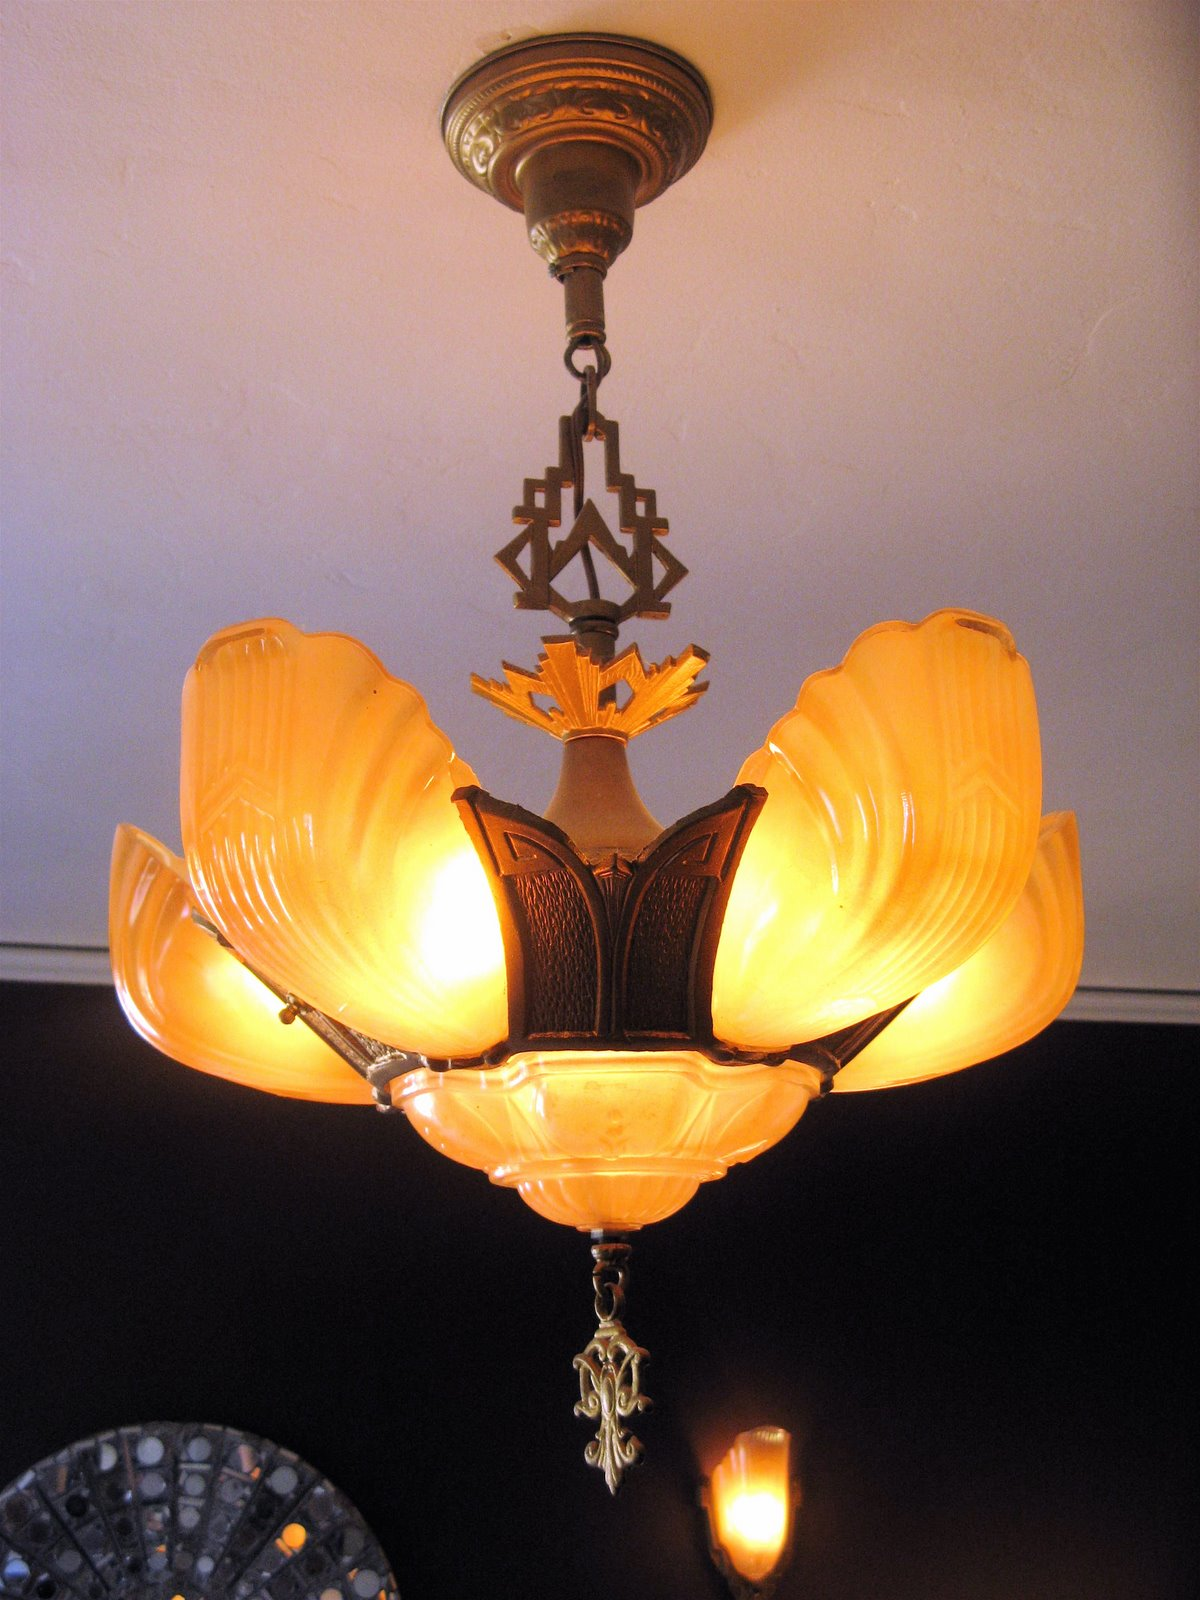 10 Reasons To Install Art Deco Outdoor Lighting Warisan